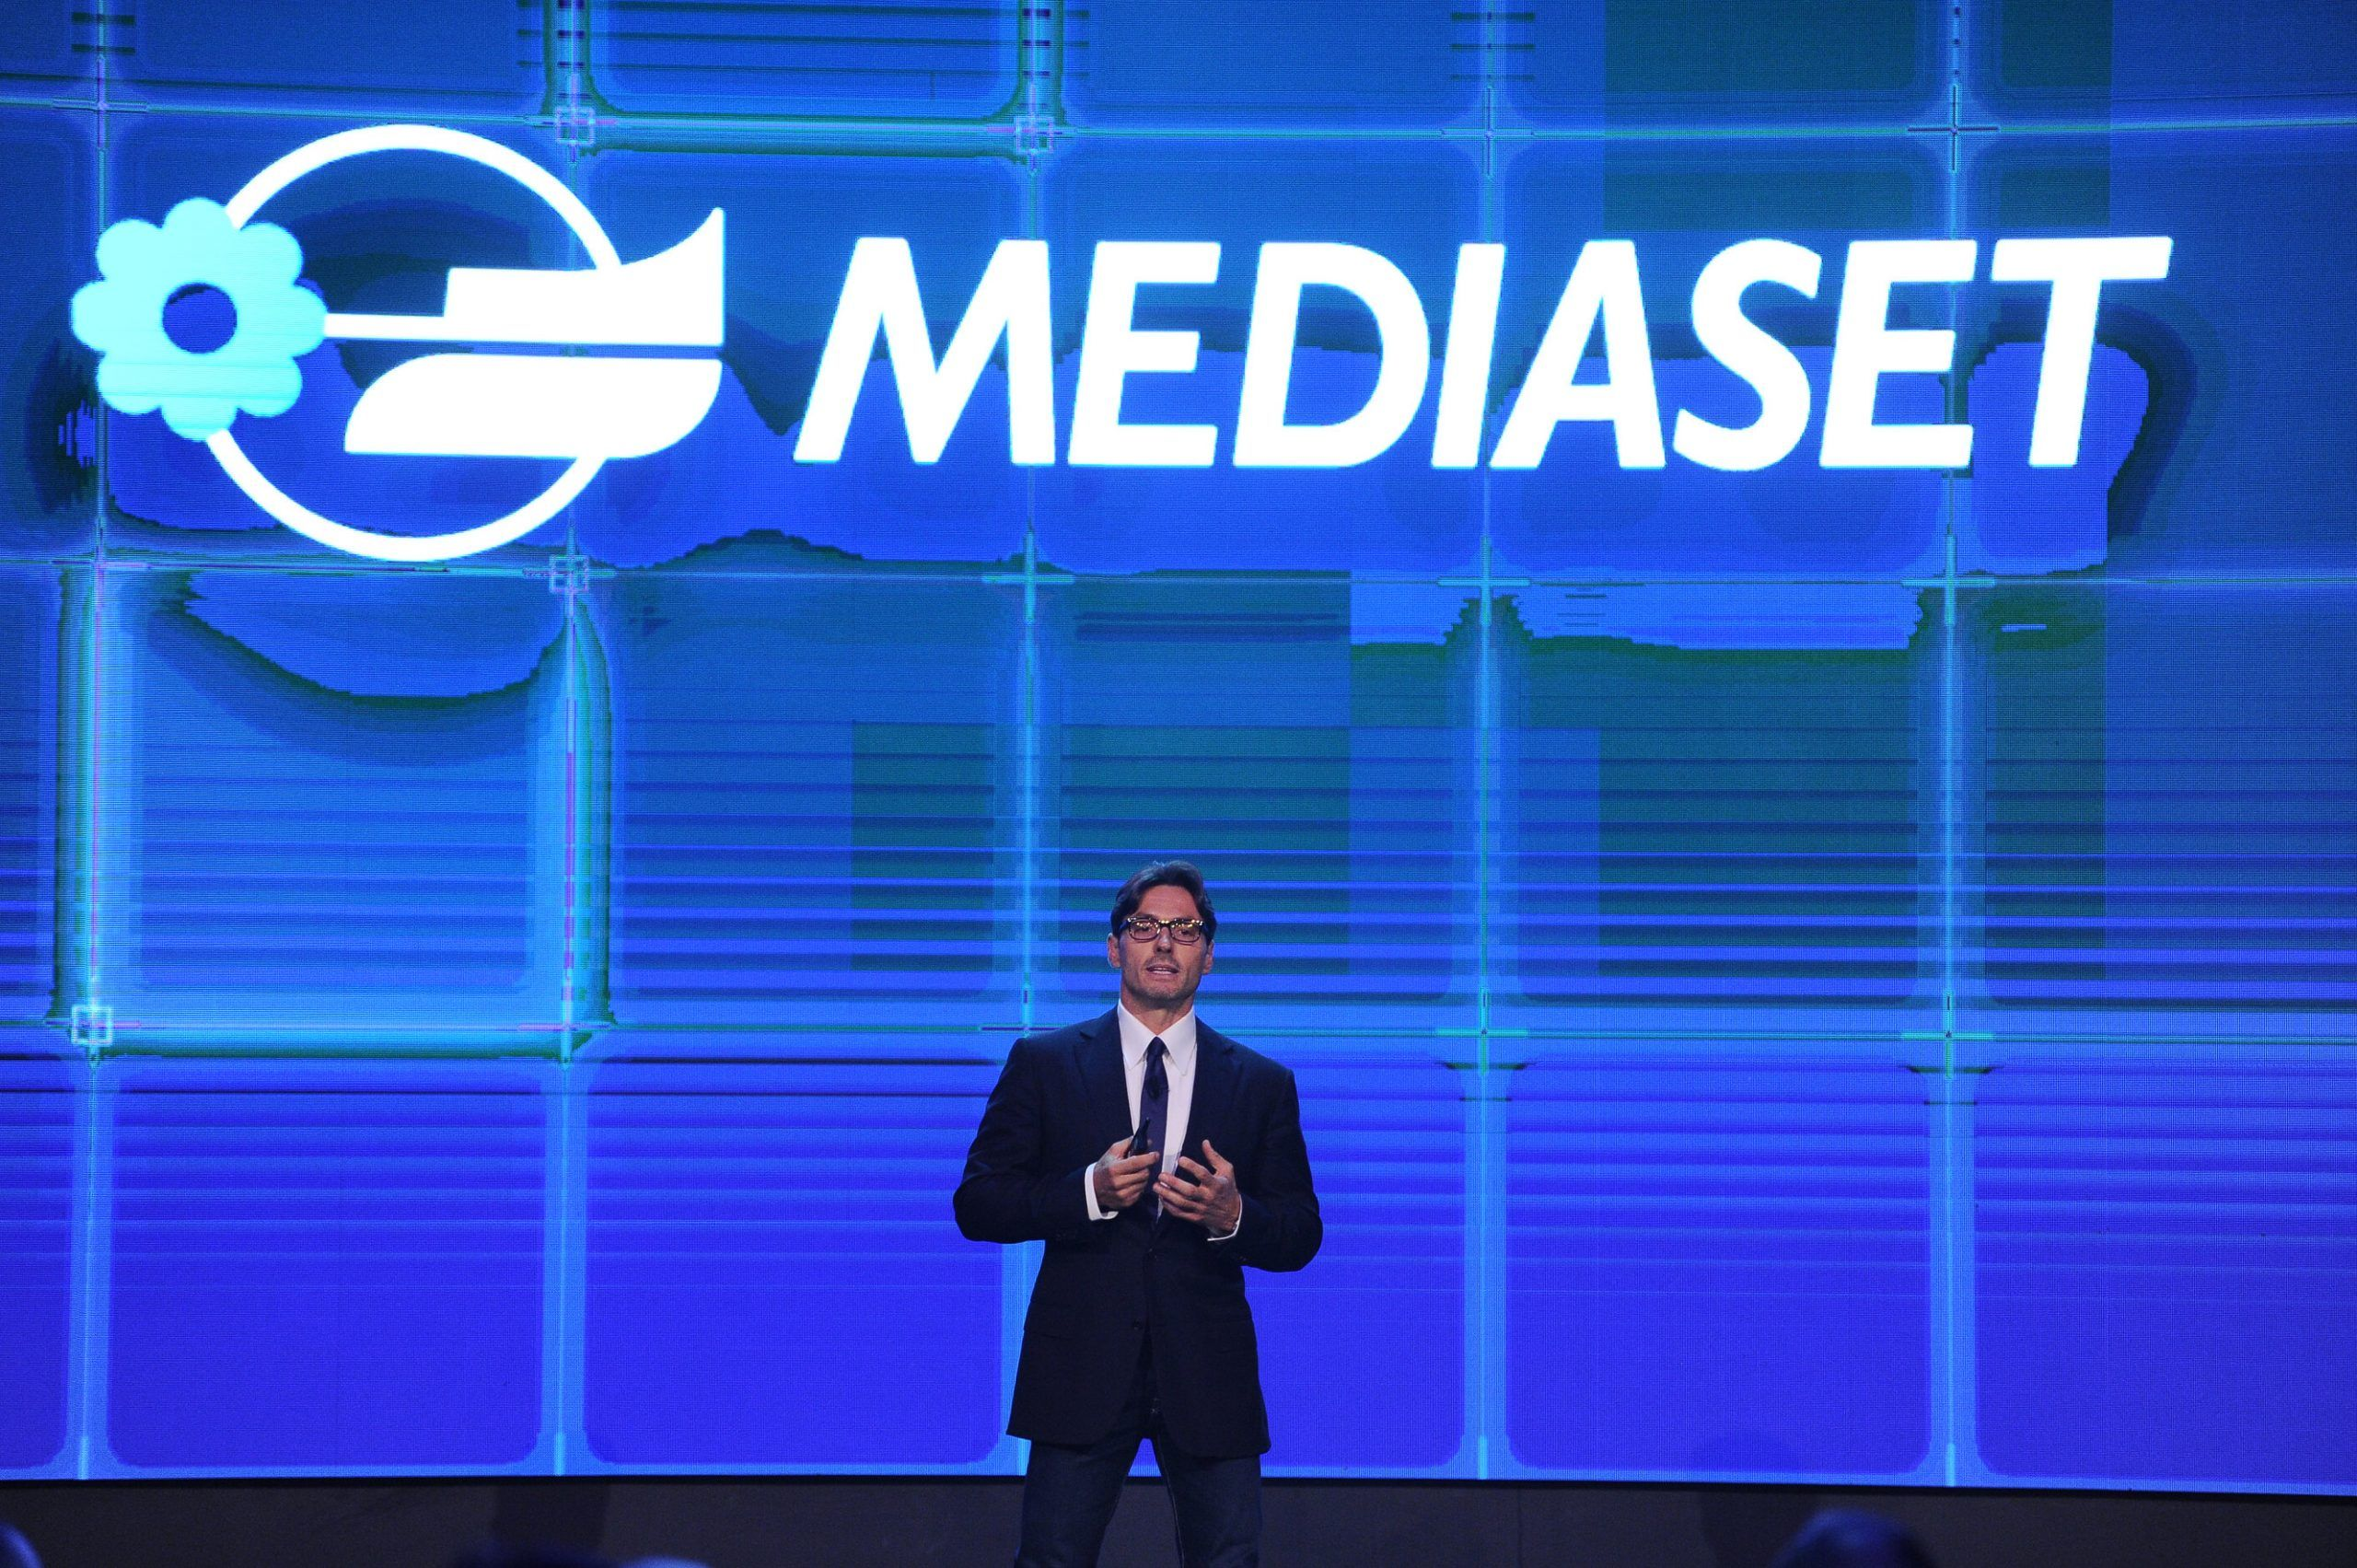 Mediaset, presentati i palinsesti 2015-2016: su Canale 5 torna Adriano Celentano